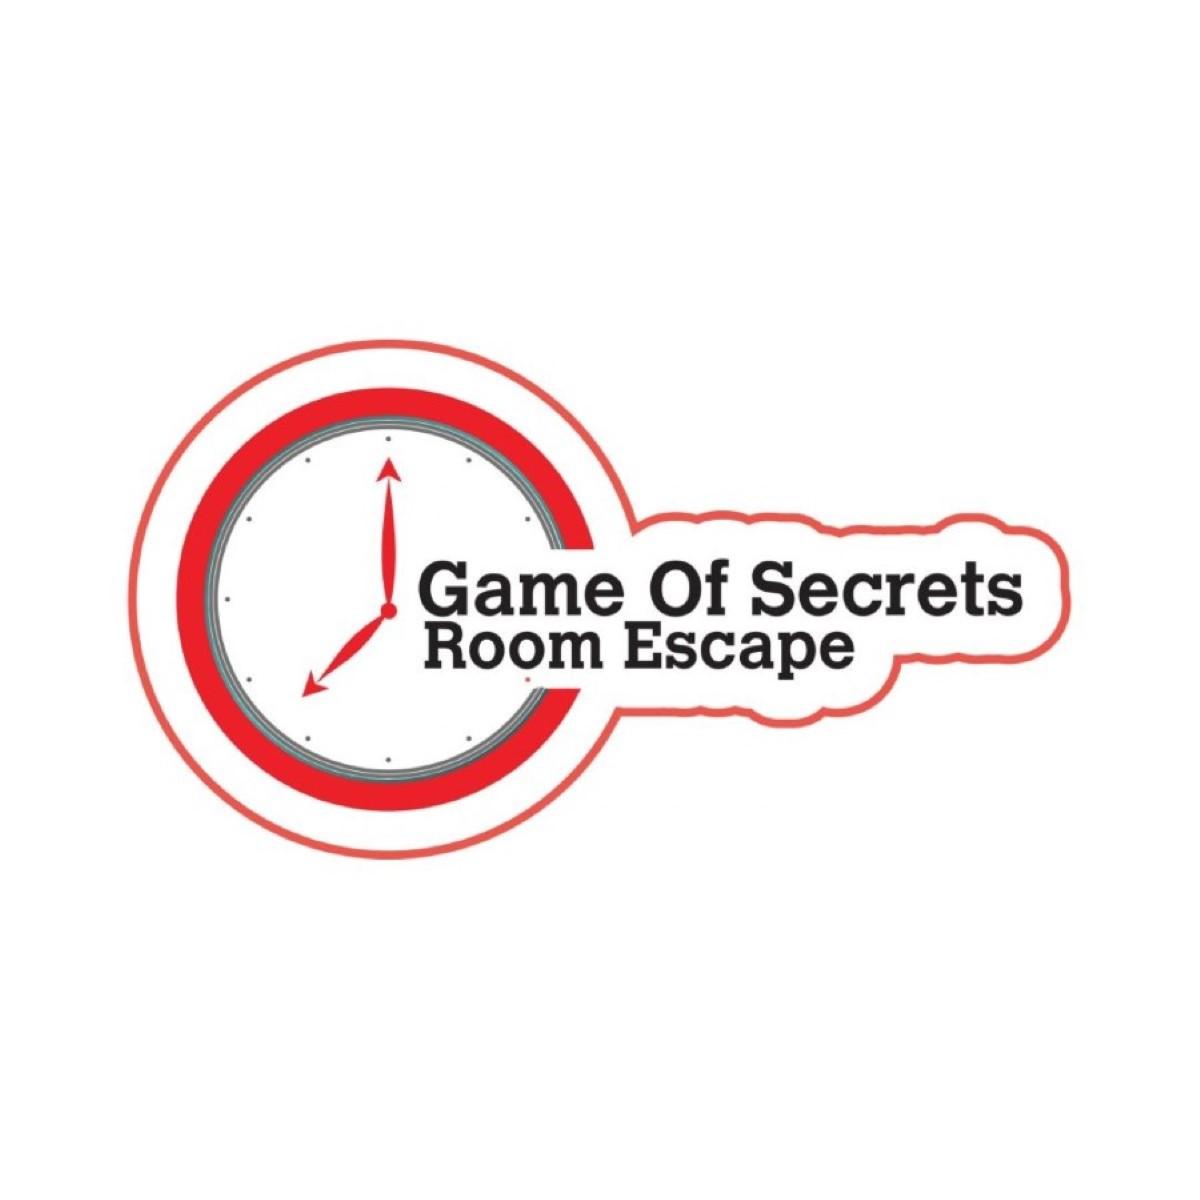 GameOfSecrets Room Escape Tenerife